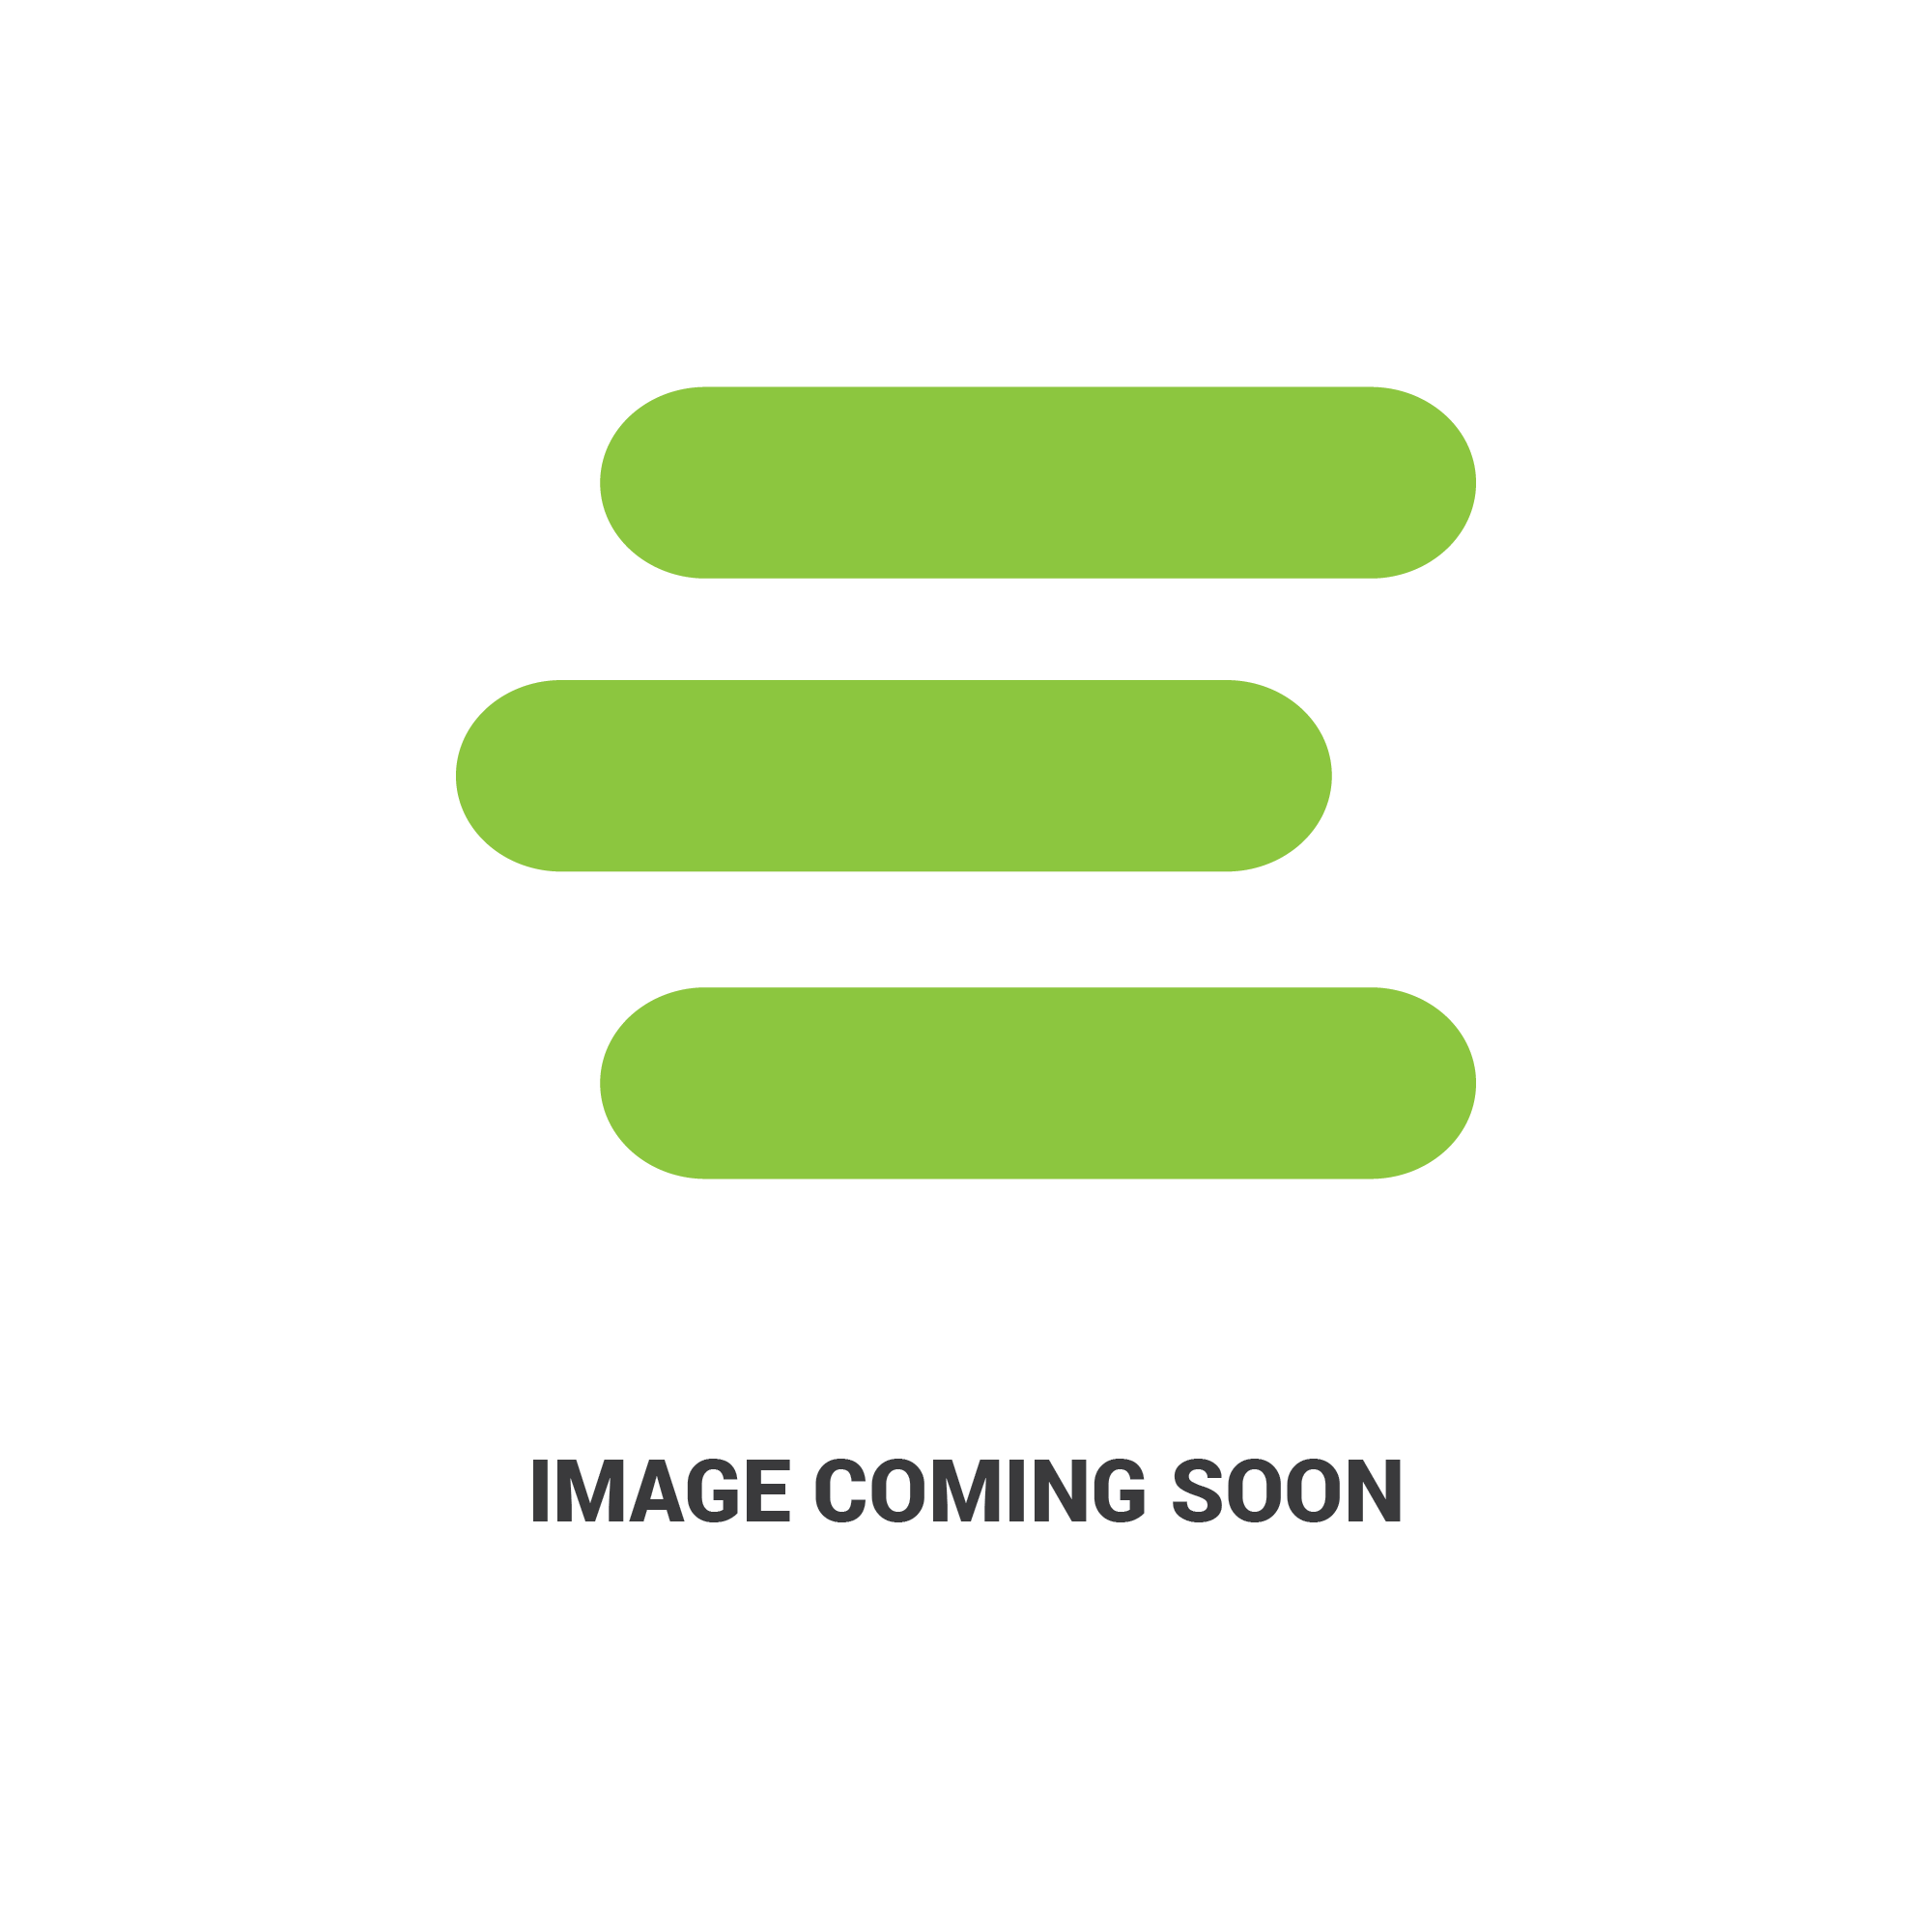 E-32330-39700edit 1.jpg